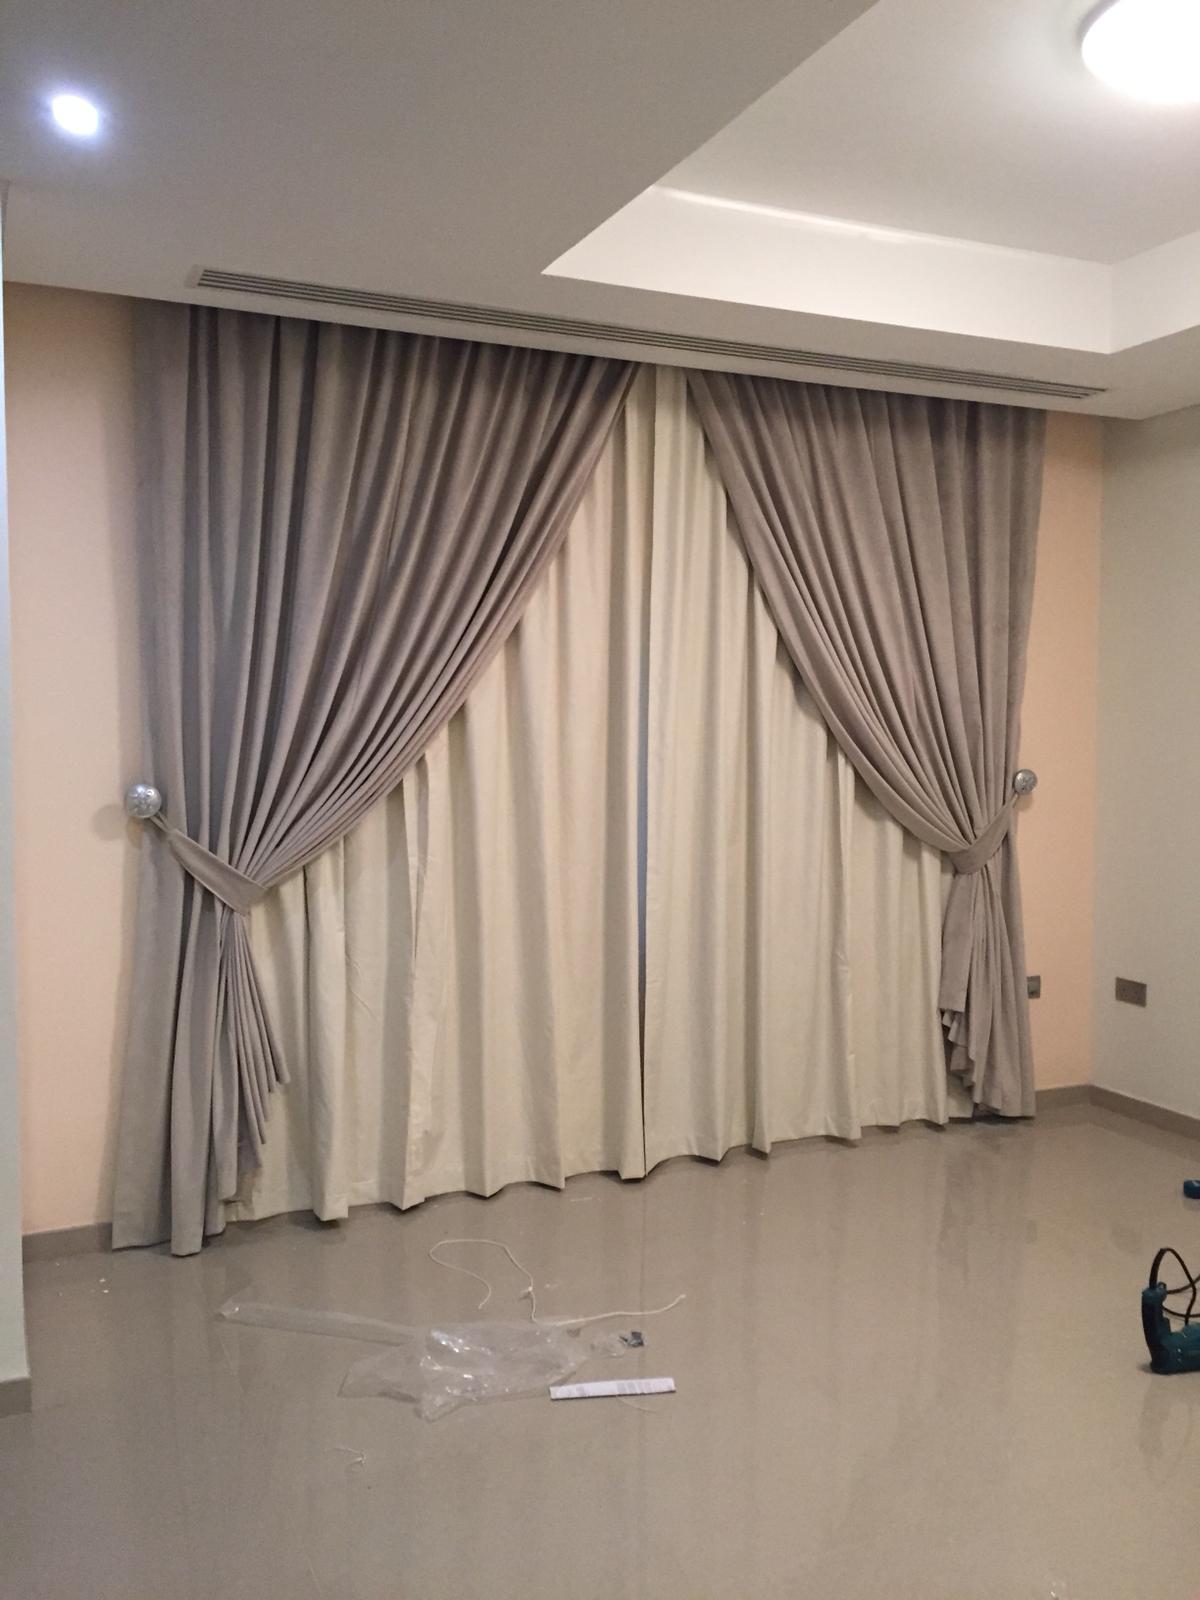 All Curtains,,, Wallpaper ,,, P.V.C for floor,,,,